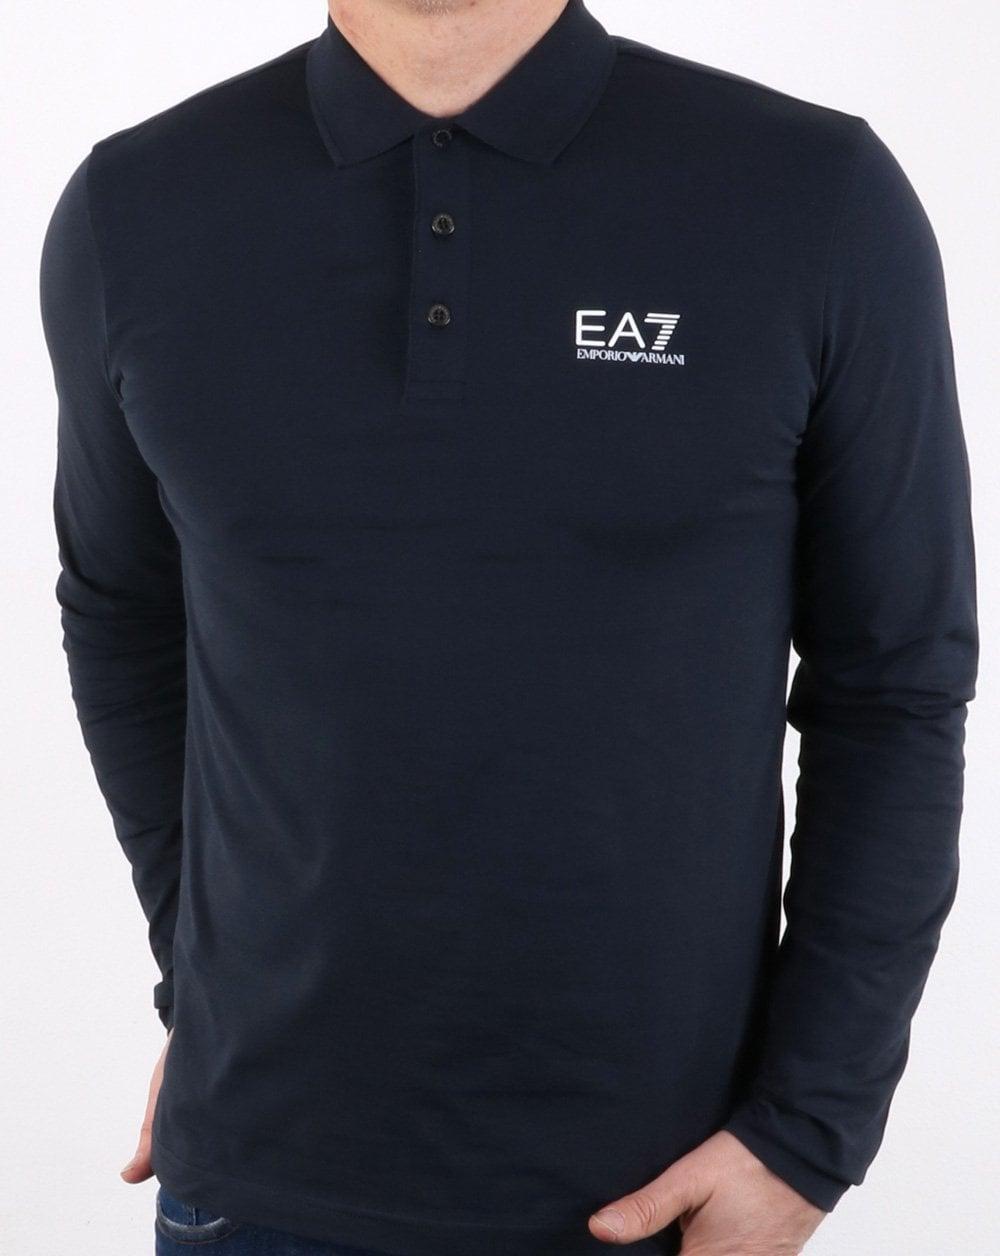 d84bb9f0 Armani Jeans Navy Long Sleeve Pique Polo Shirt